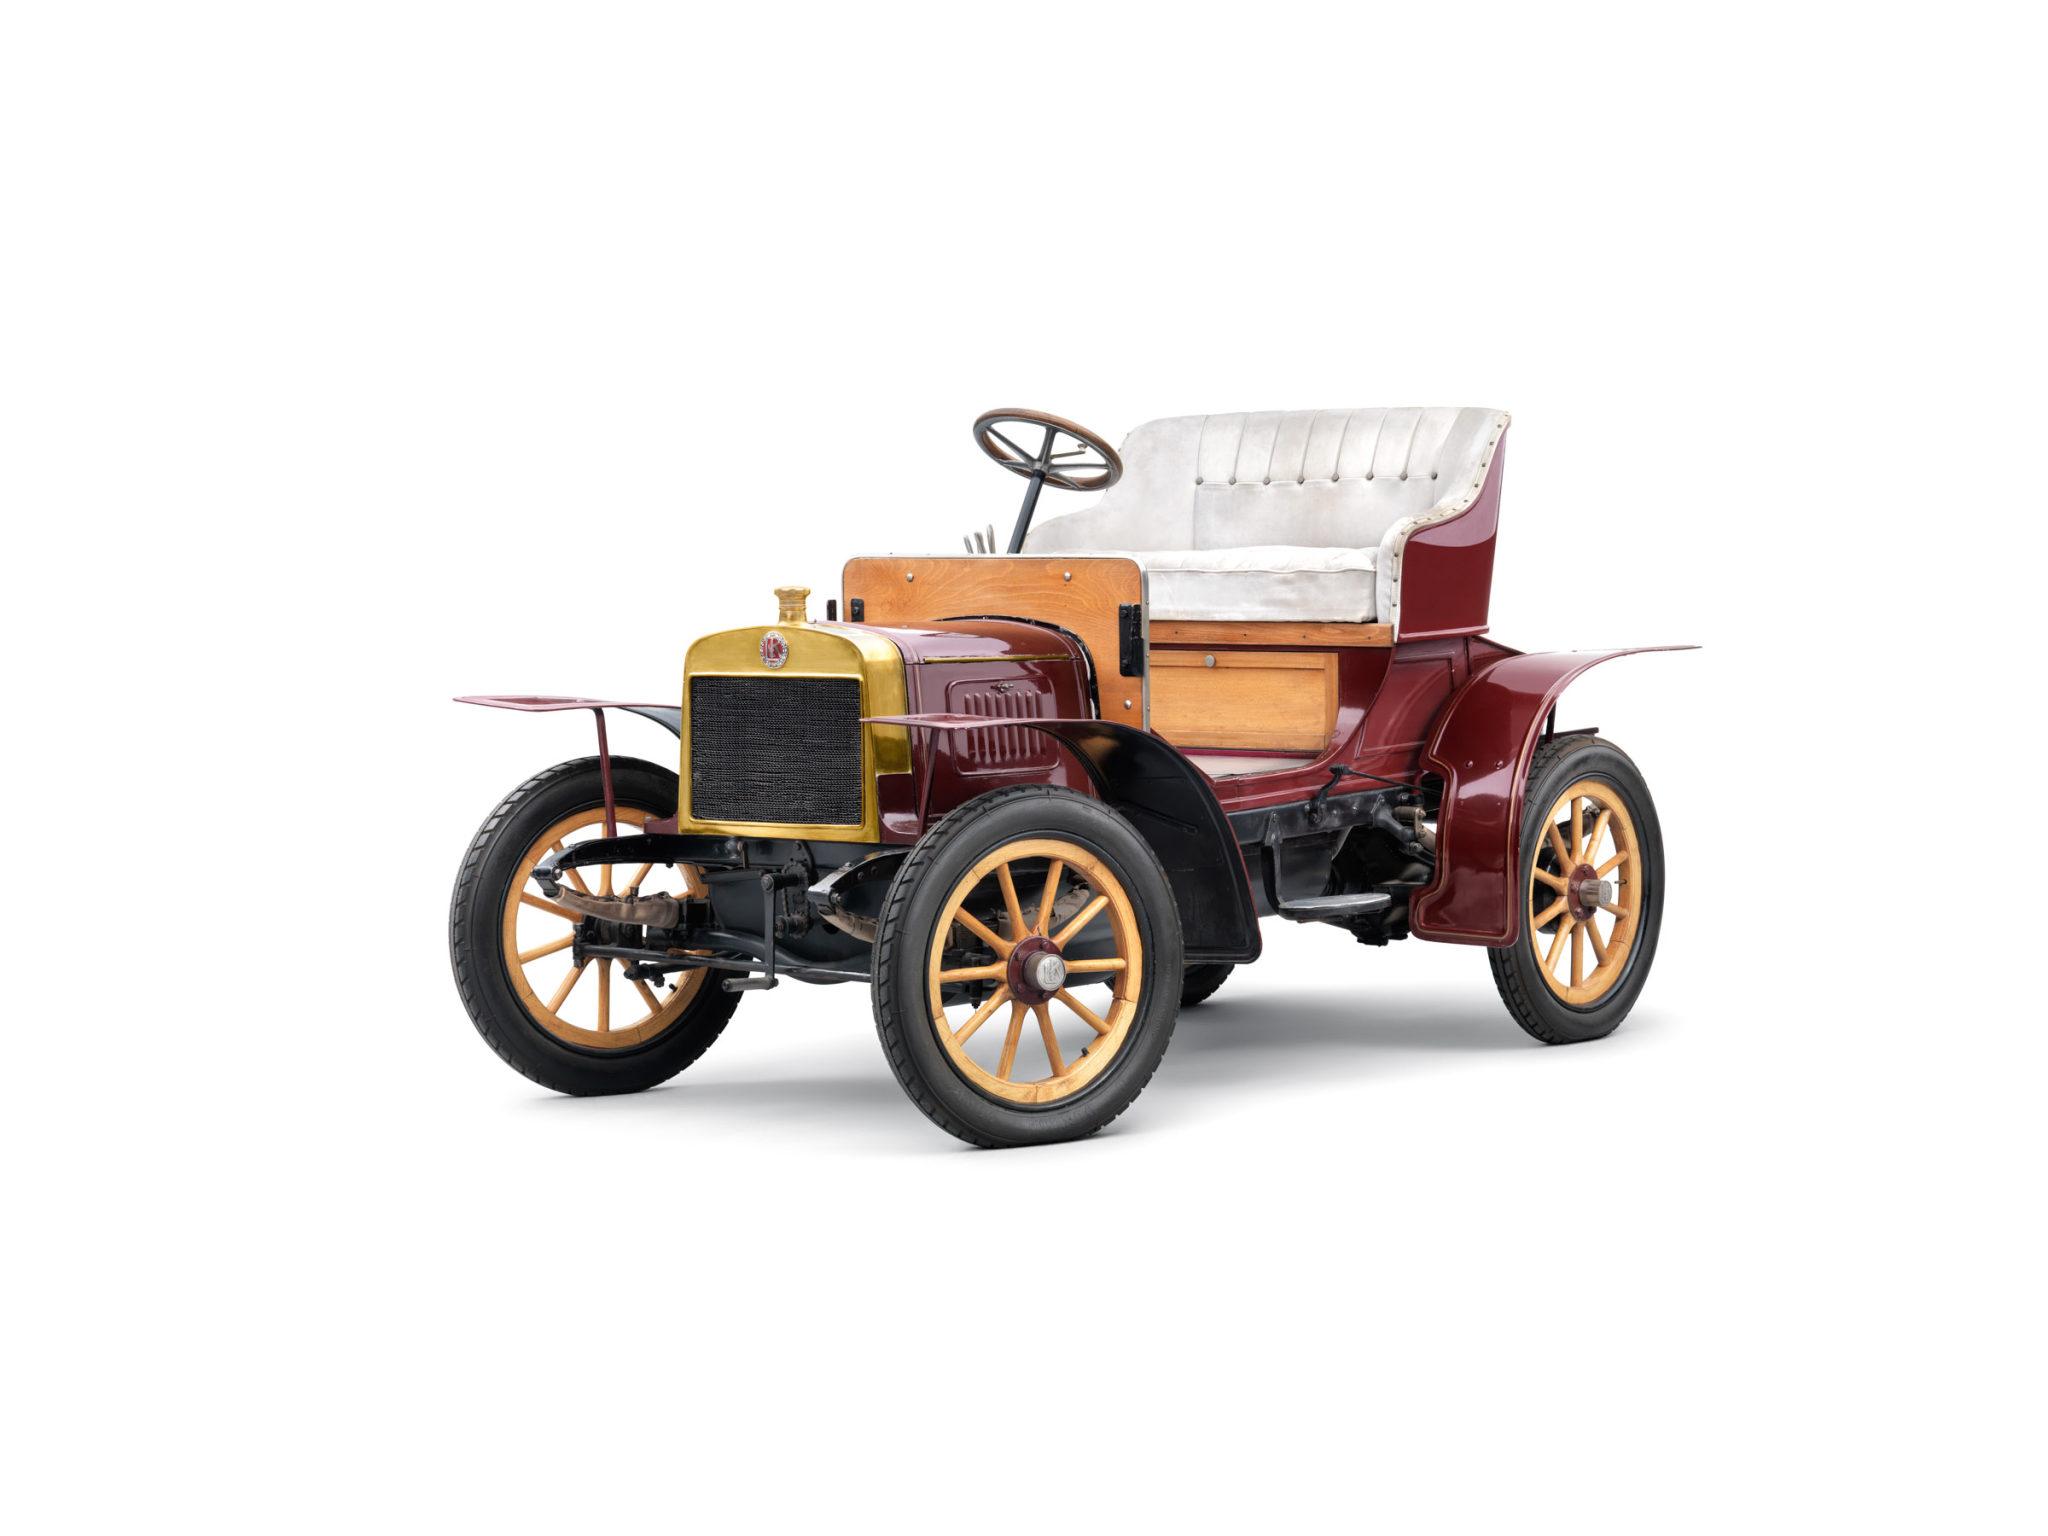 1906_lk-voiturette-a-1